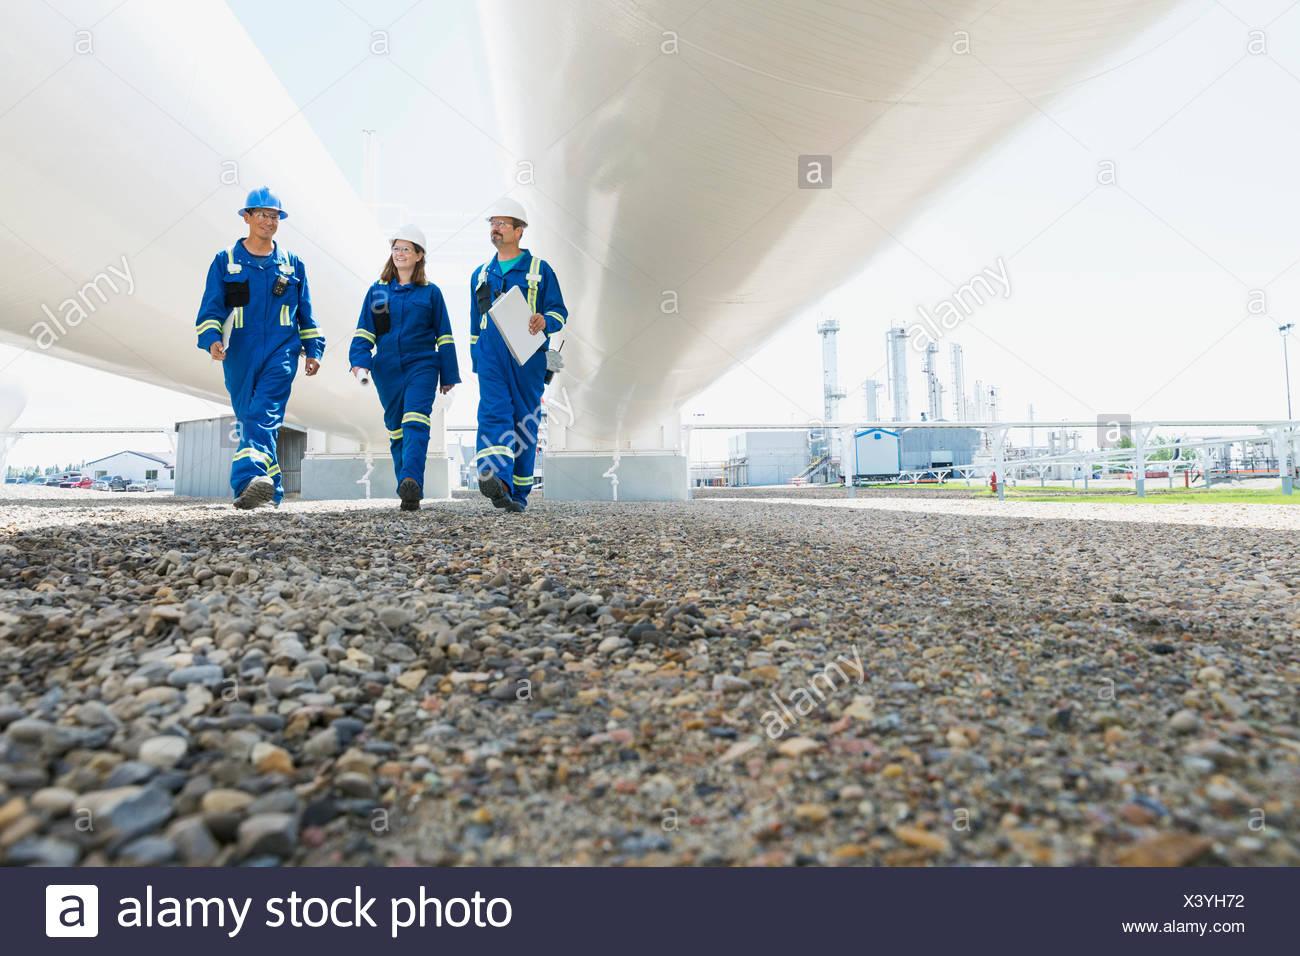 Workers walking below tanks at gas plant - Stock Image